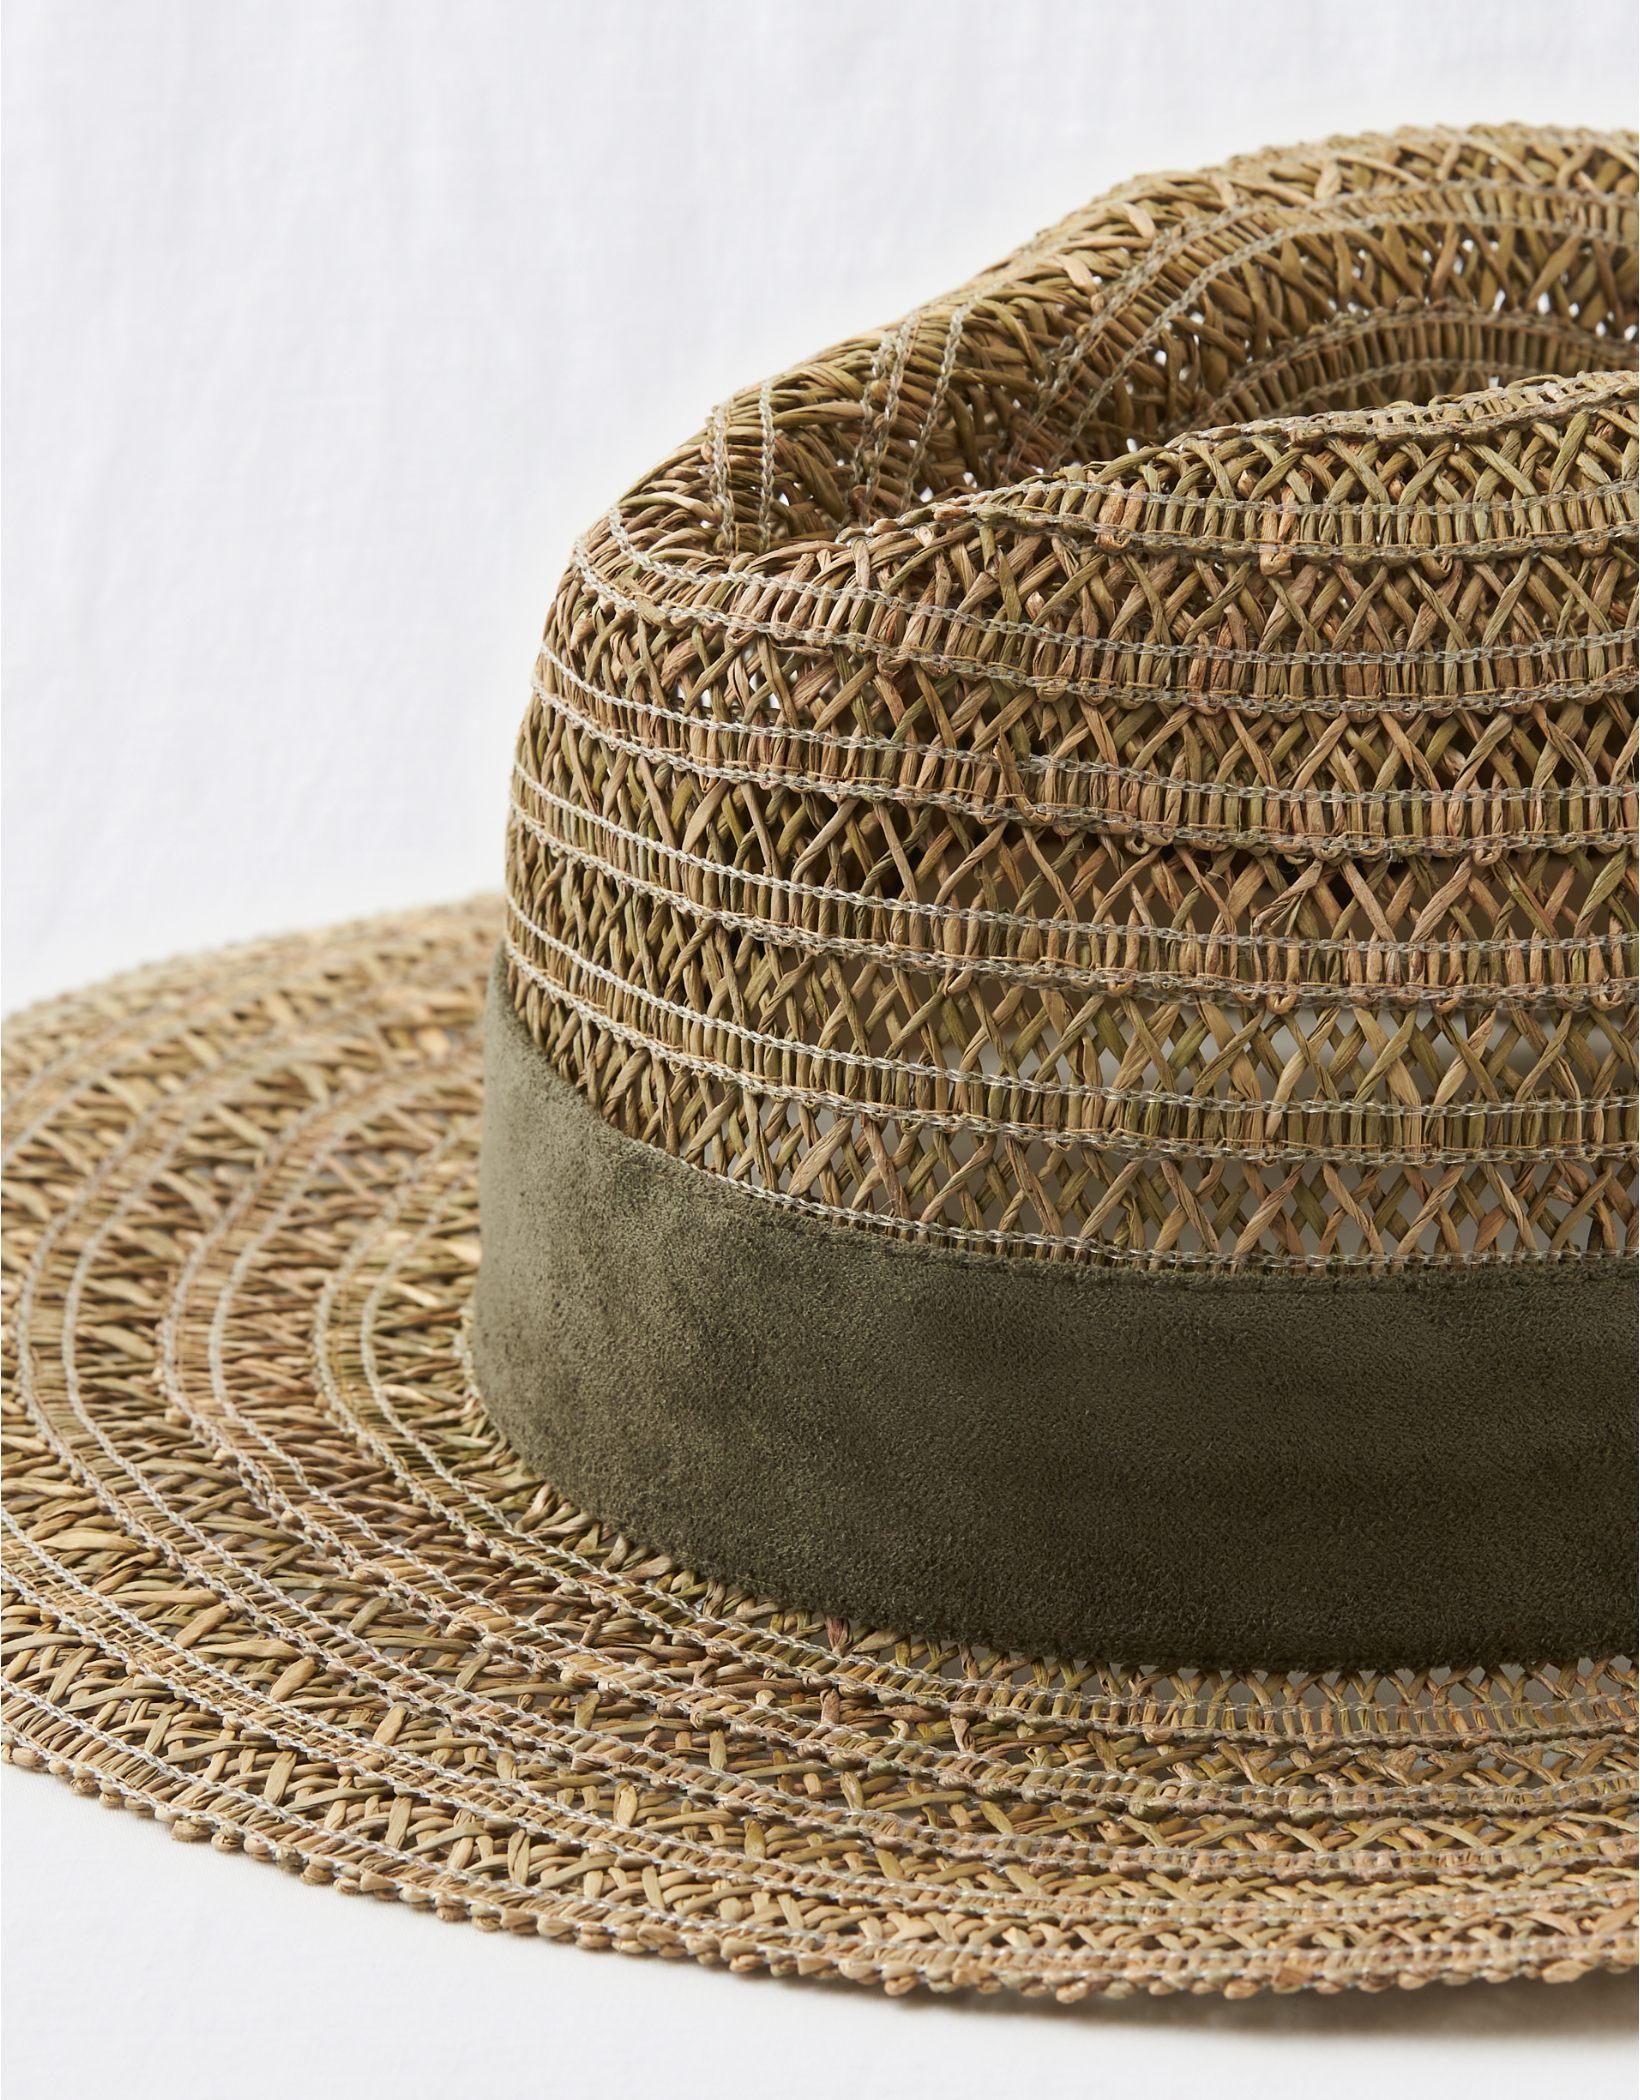 Aerie Panama Hat